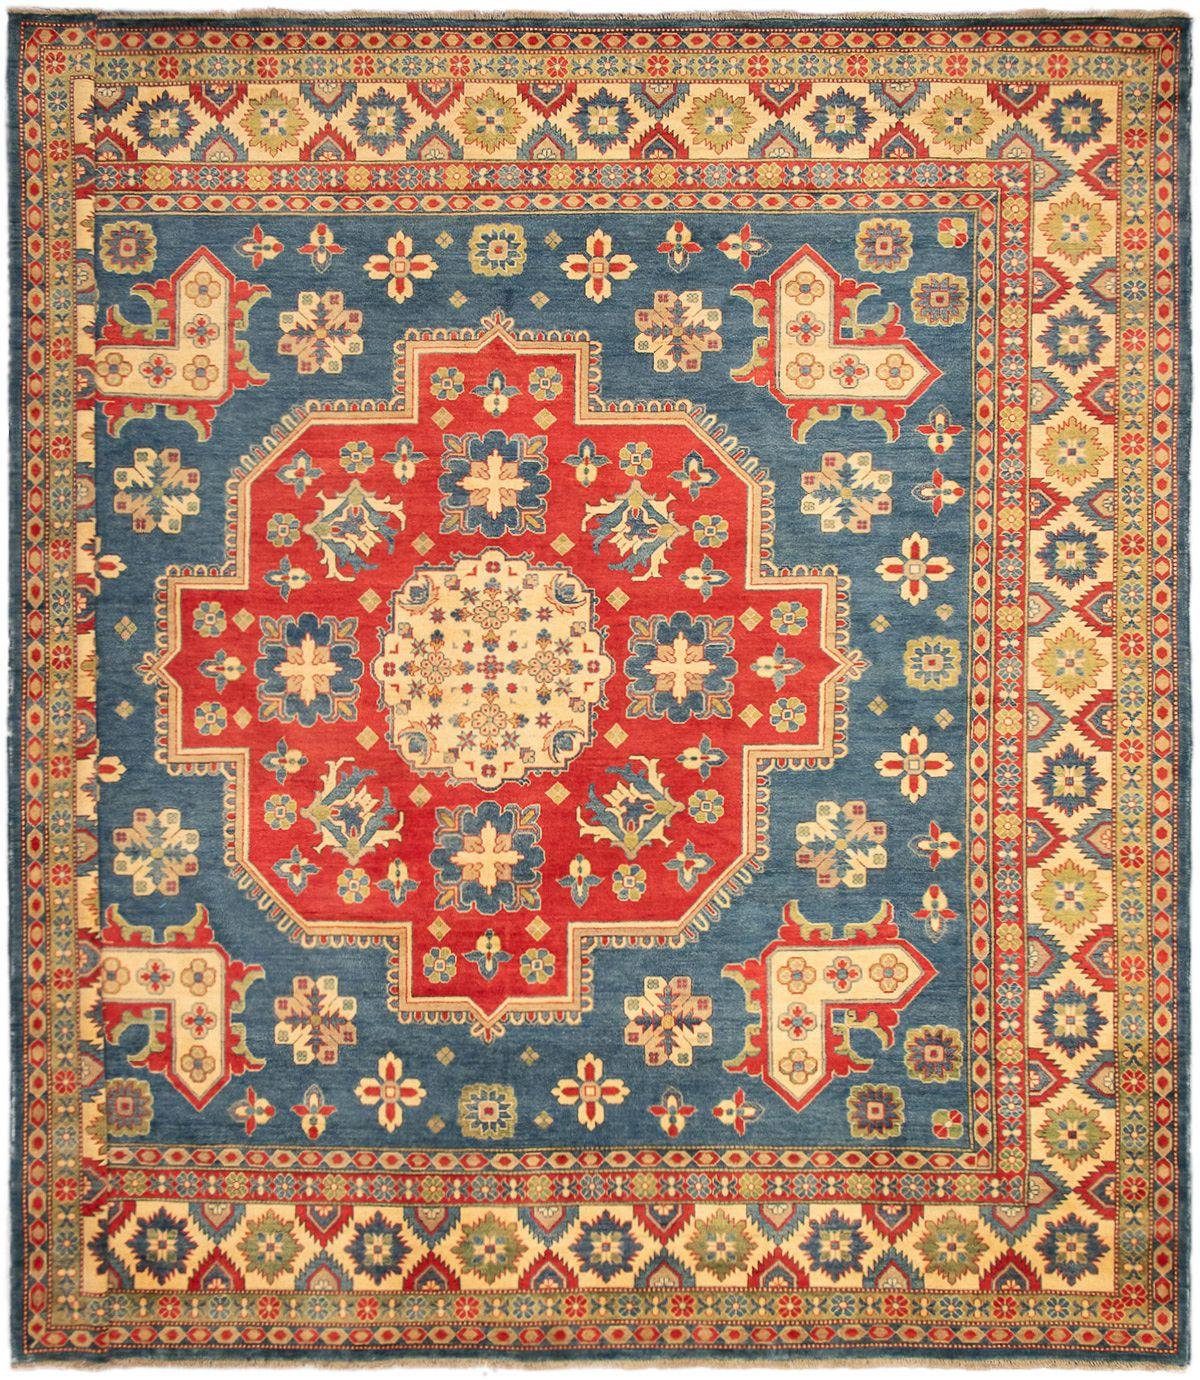 "Hand-knotted Finest Gazni Dark Blue Wool Rug 13'1"" x 12'11"" Size: 13'1"" x 12'11"""